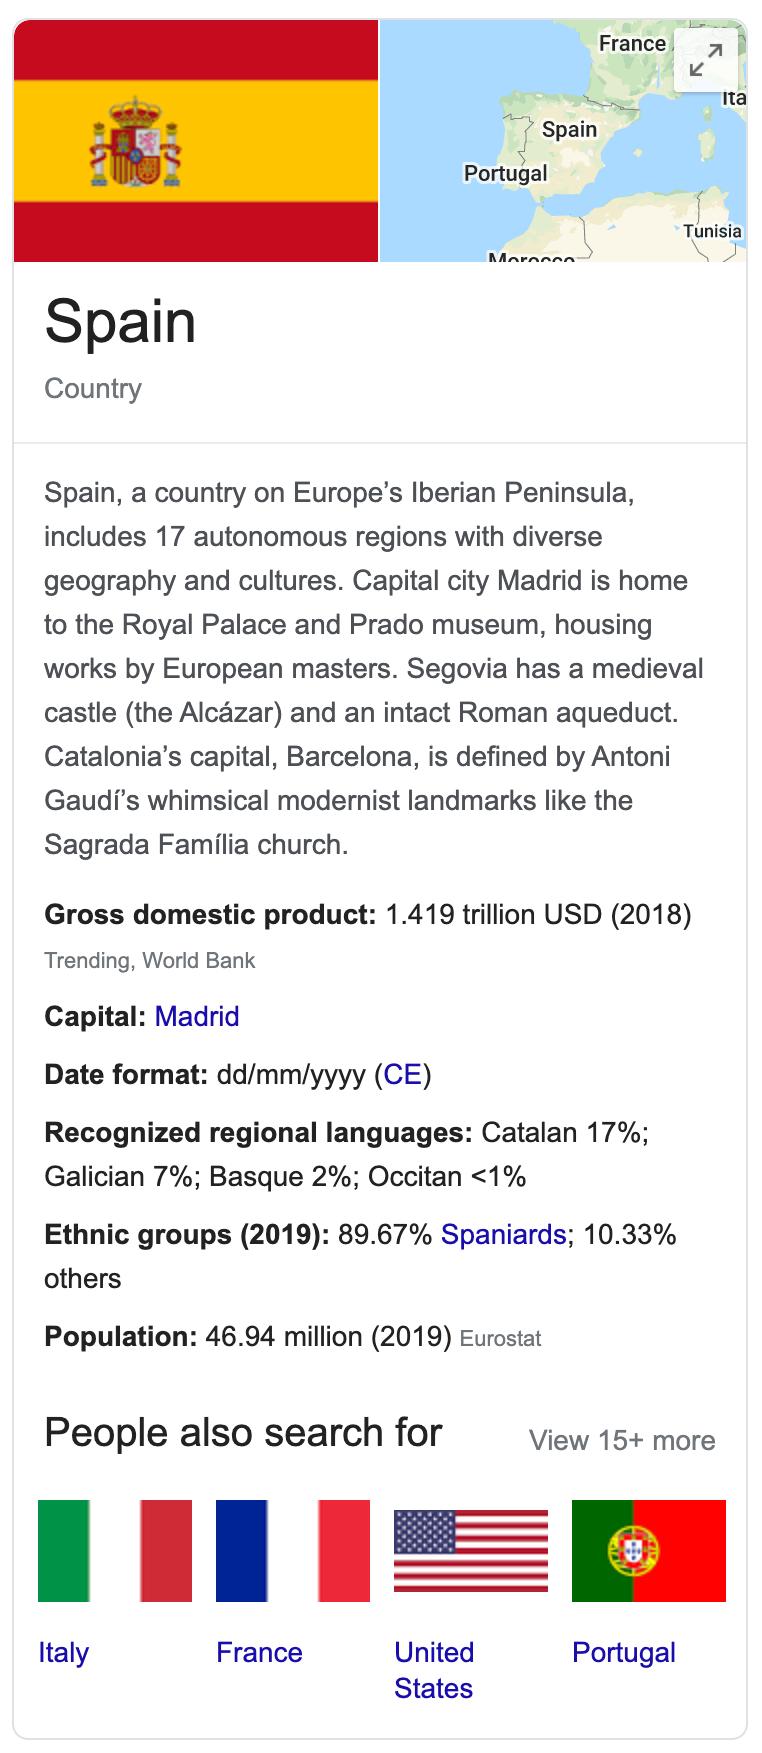 Spain - knowledge graph Google